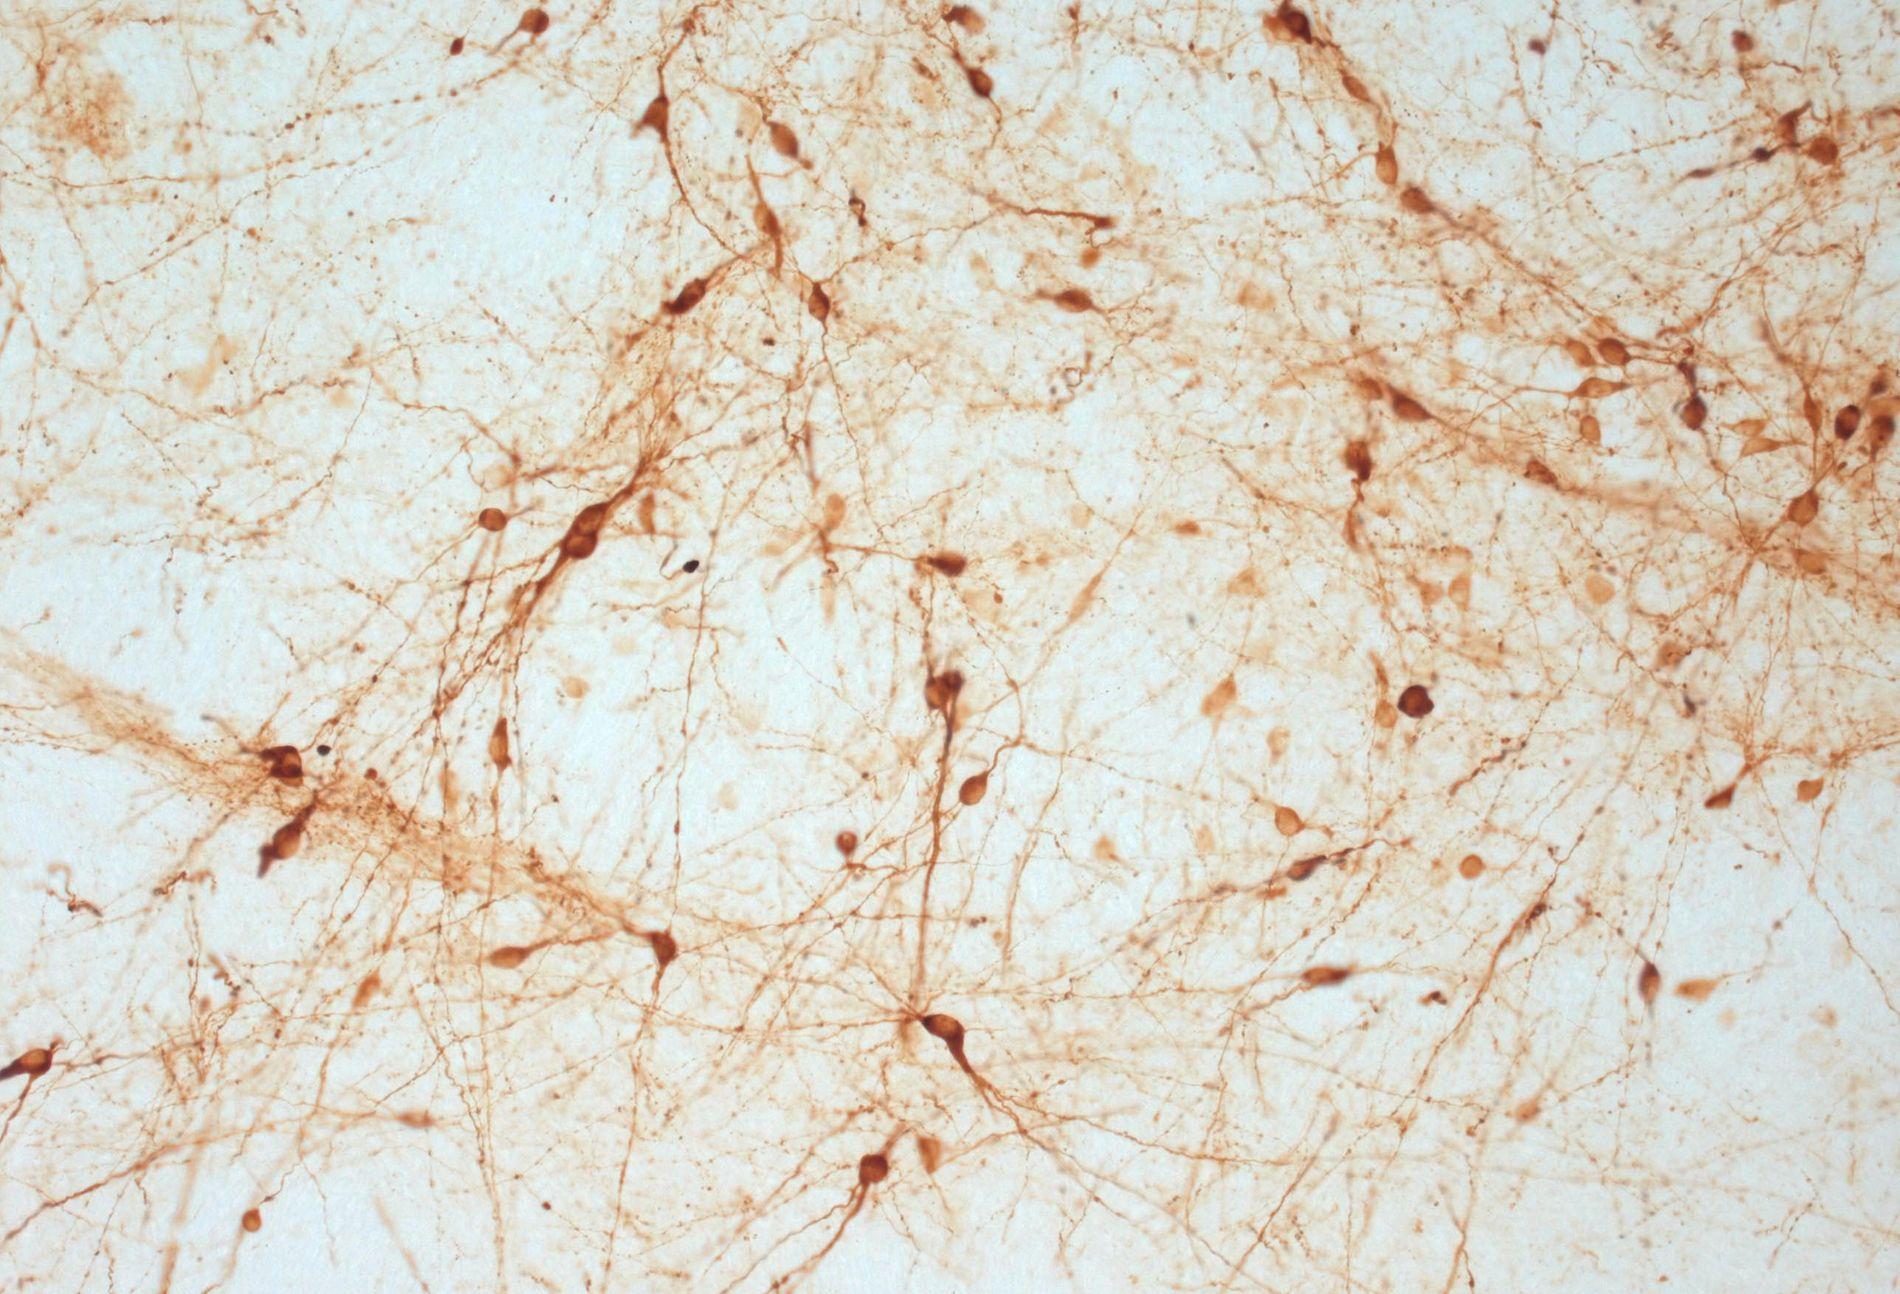 TRANSPLANTERTE CELLER: Dette bilder viser transplanterte dopaminceller som har modnet i hjernen til en rotte.